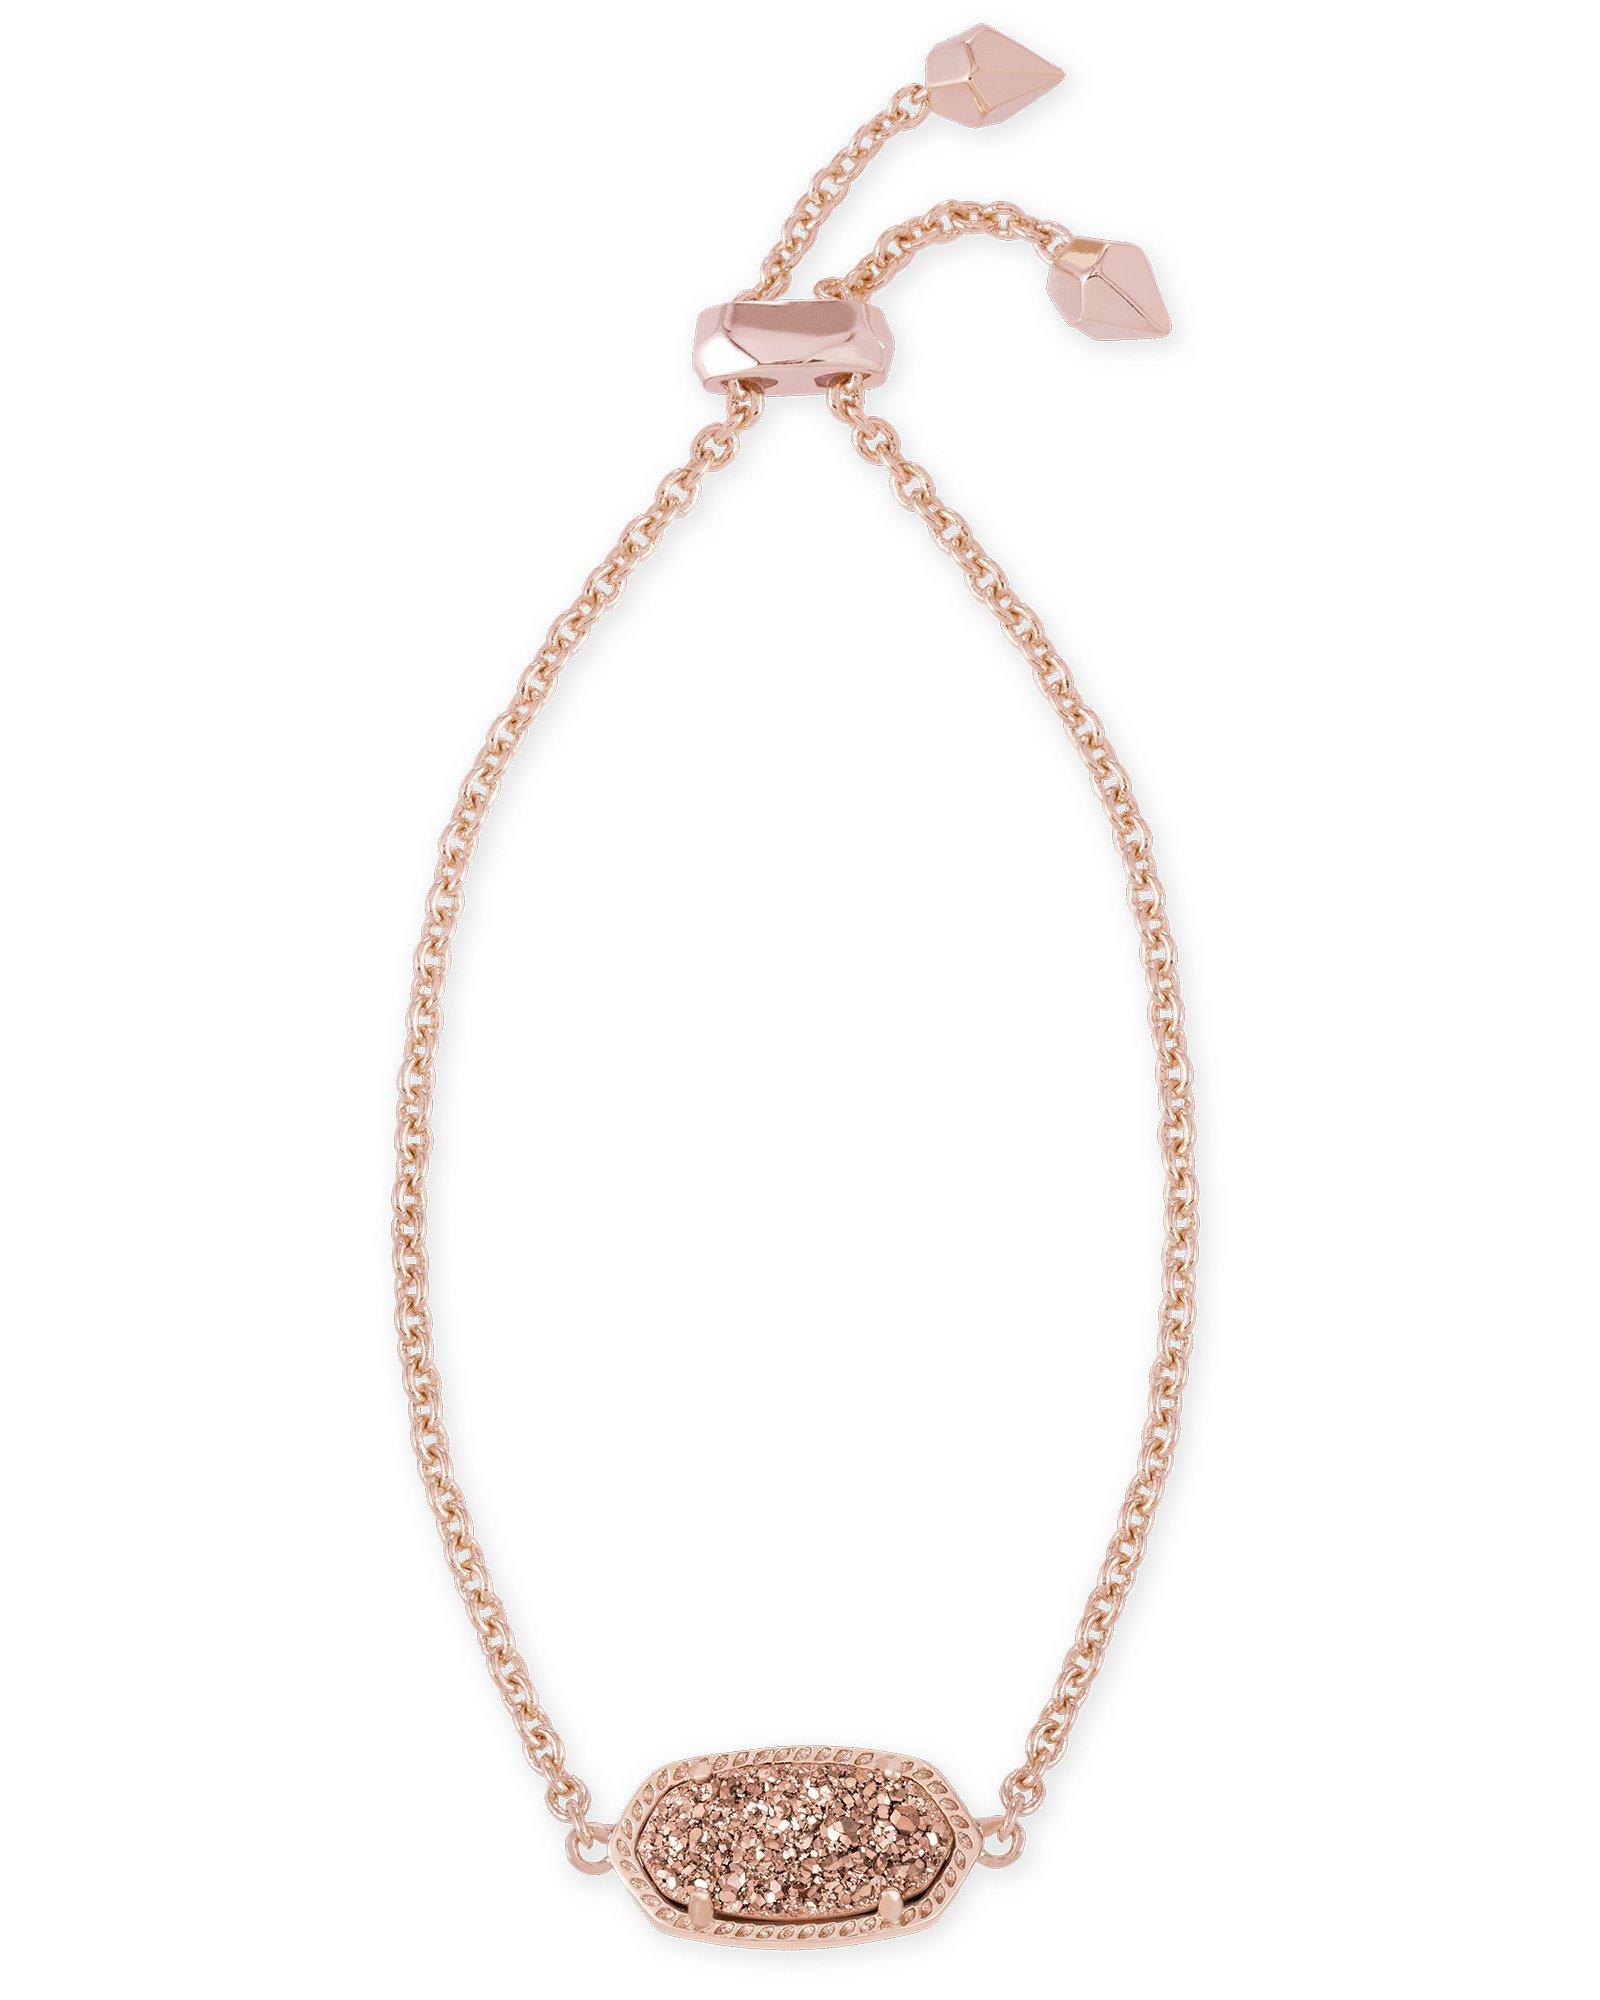 Kendra Scott Elaina Adjustable Chain Bracelet In Rose Gold Drusy